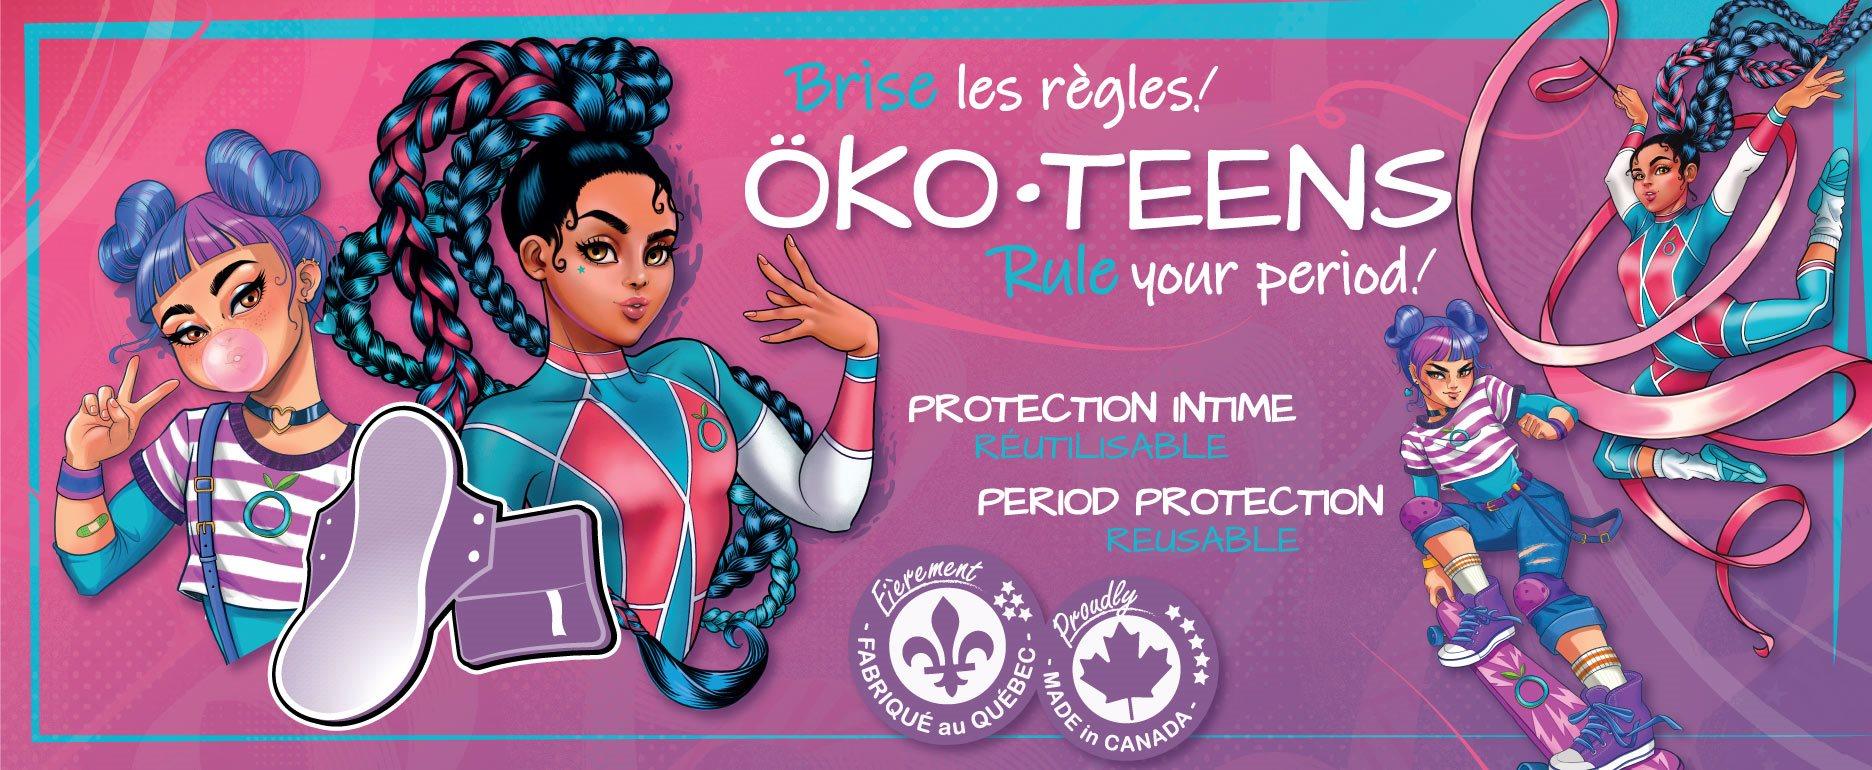 Brise Les Règle avec les Öko-Teens